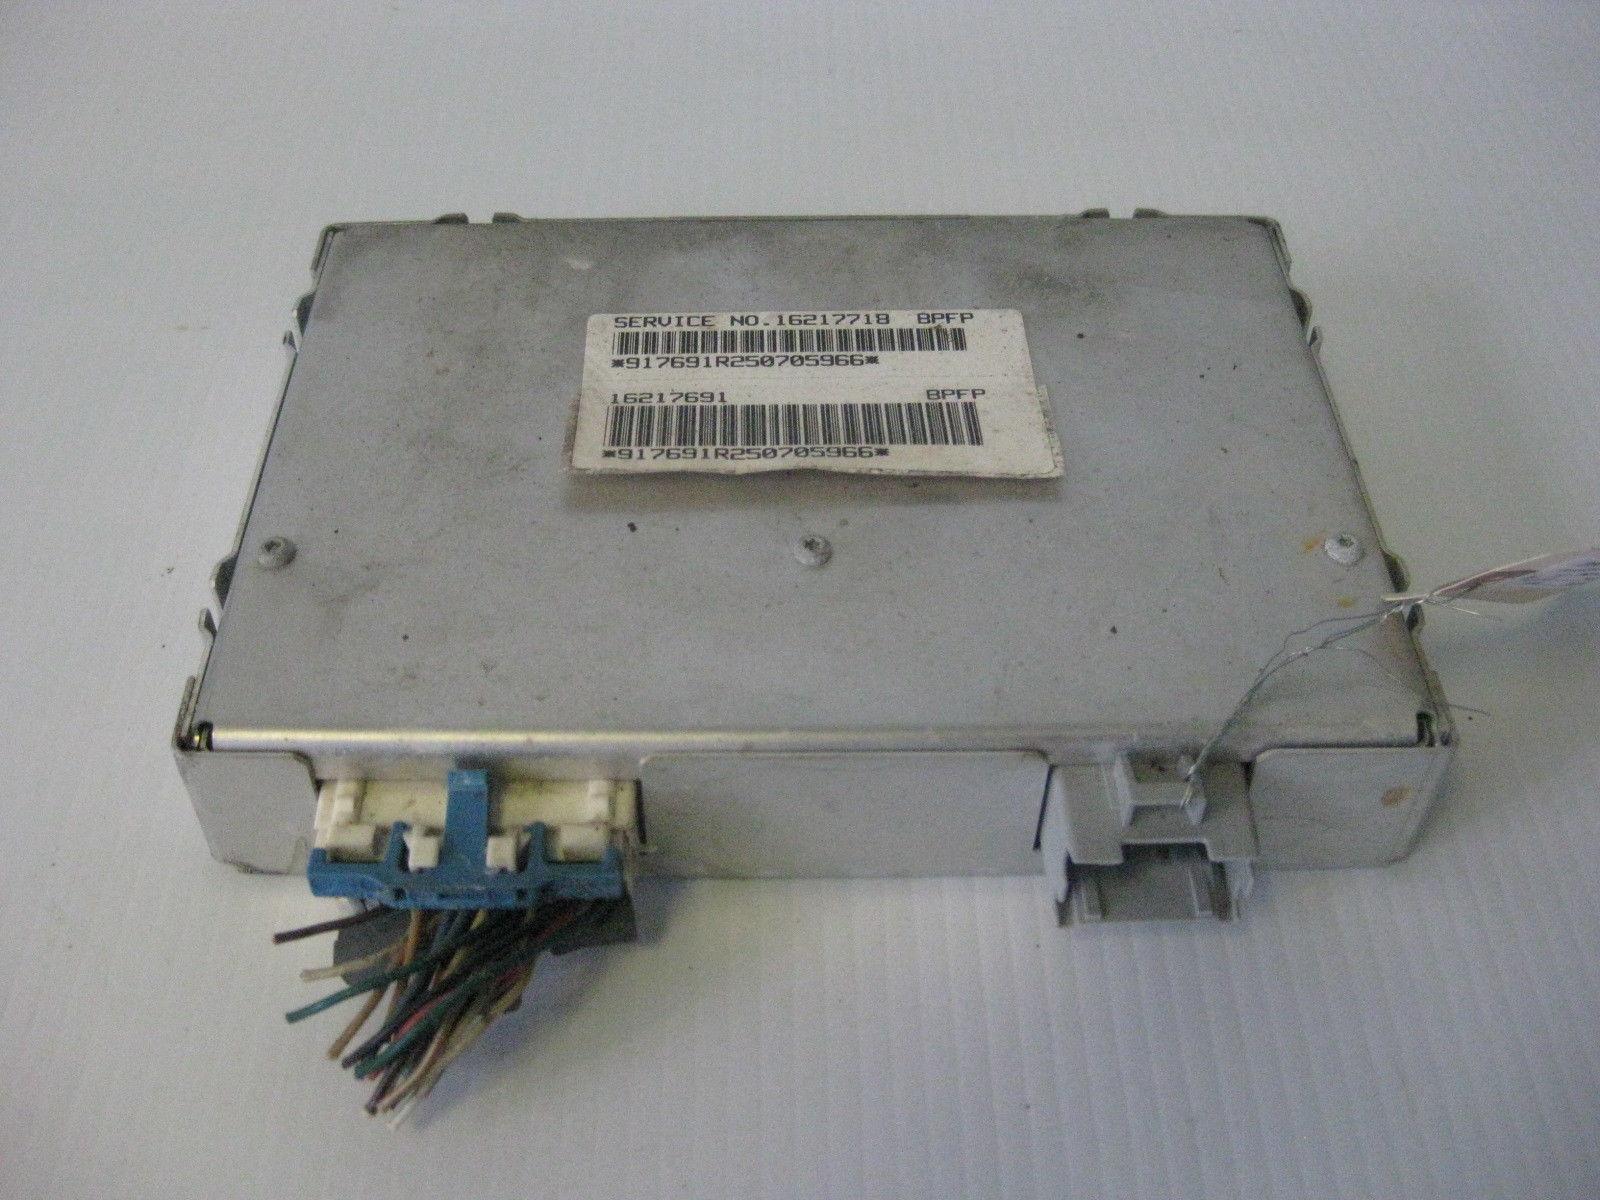 Oldsmobile Cutlass 1995  Anti Lock Brake Control Module Computer OEM 16217691